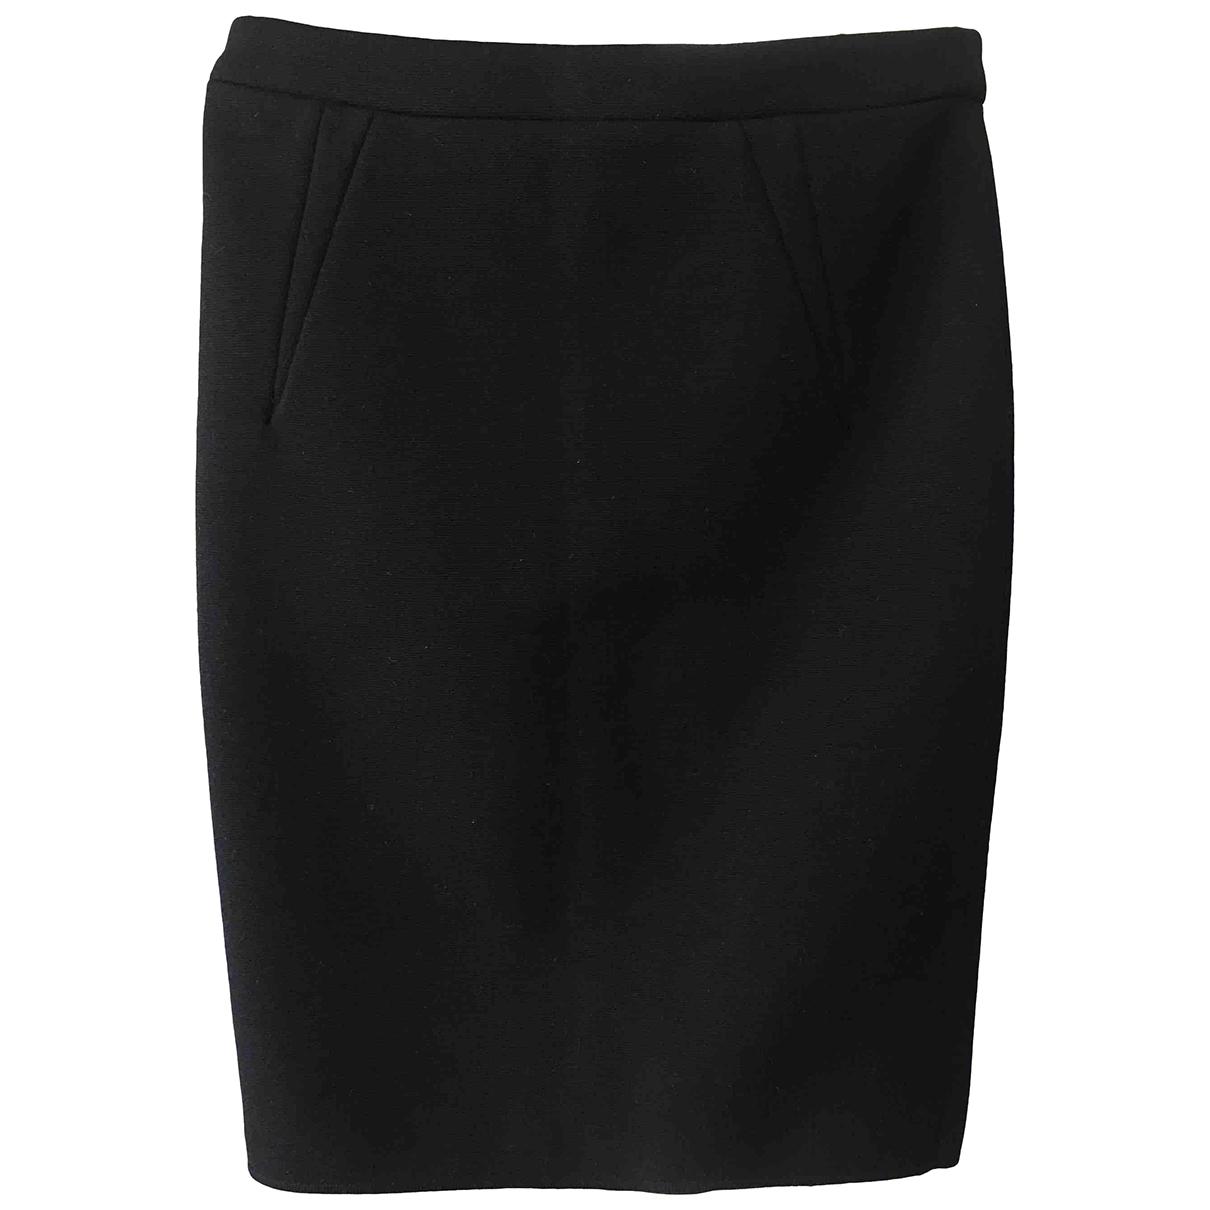 Givenchy \N Black Wool skirt for Women 36 FR